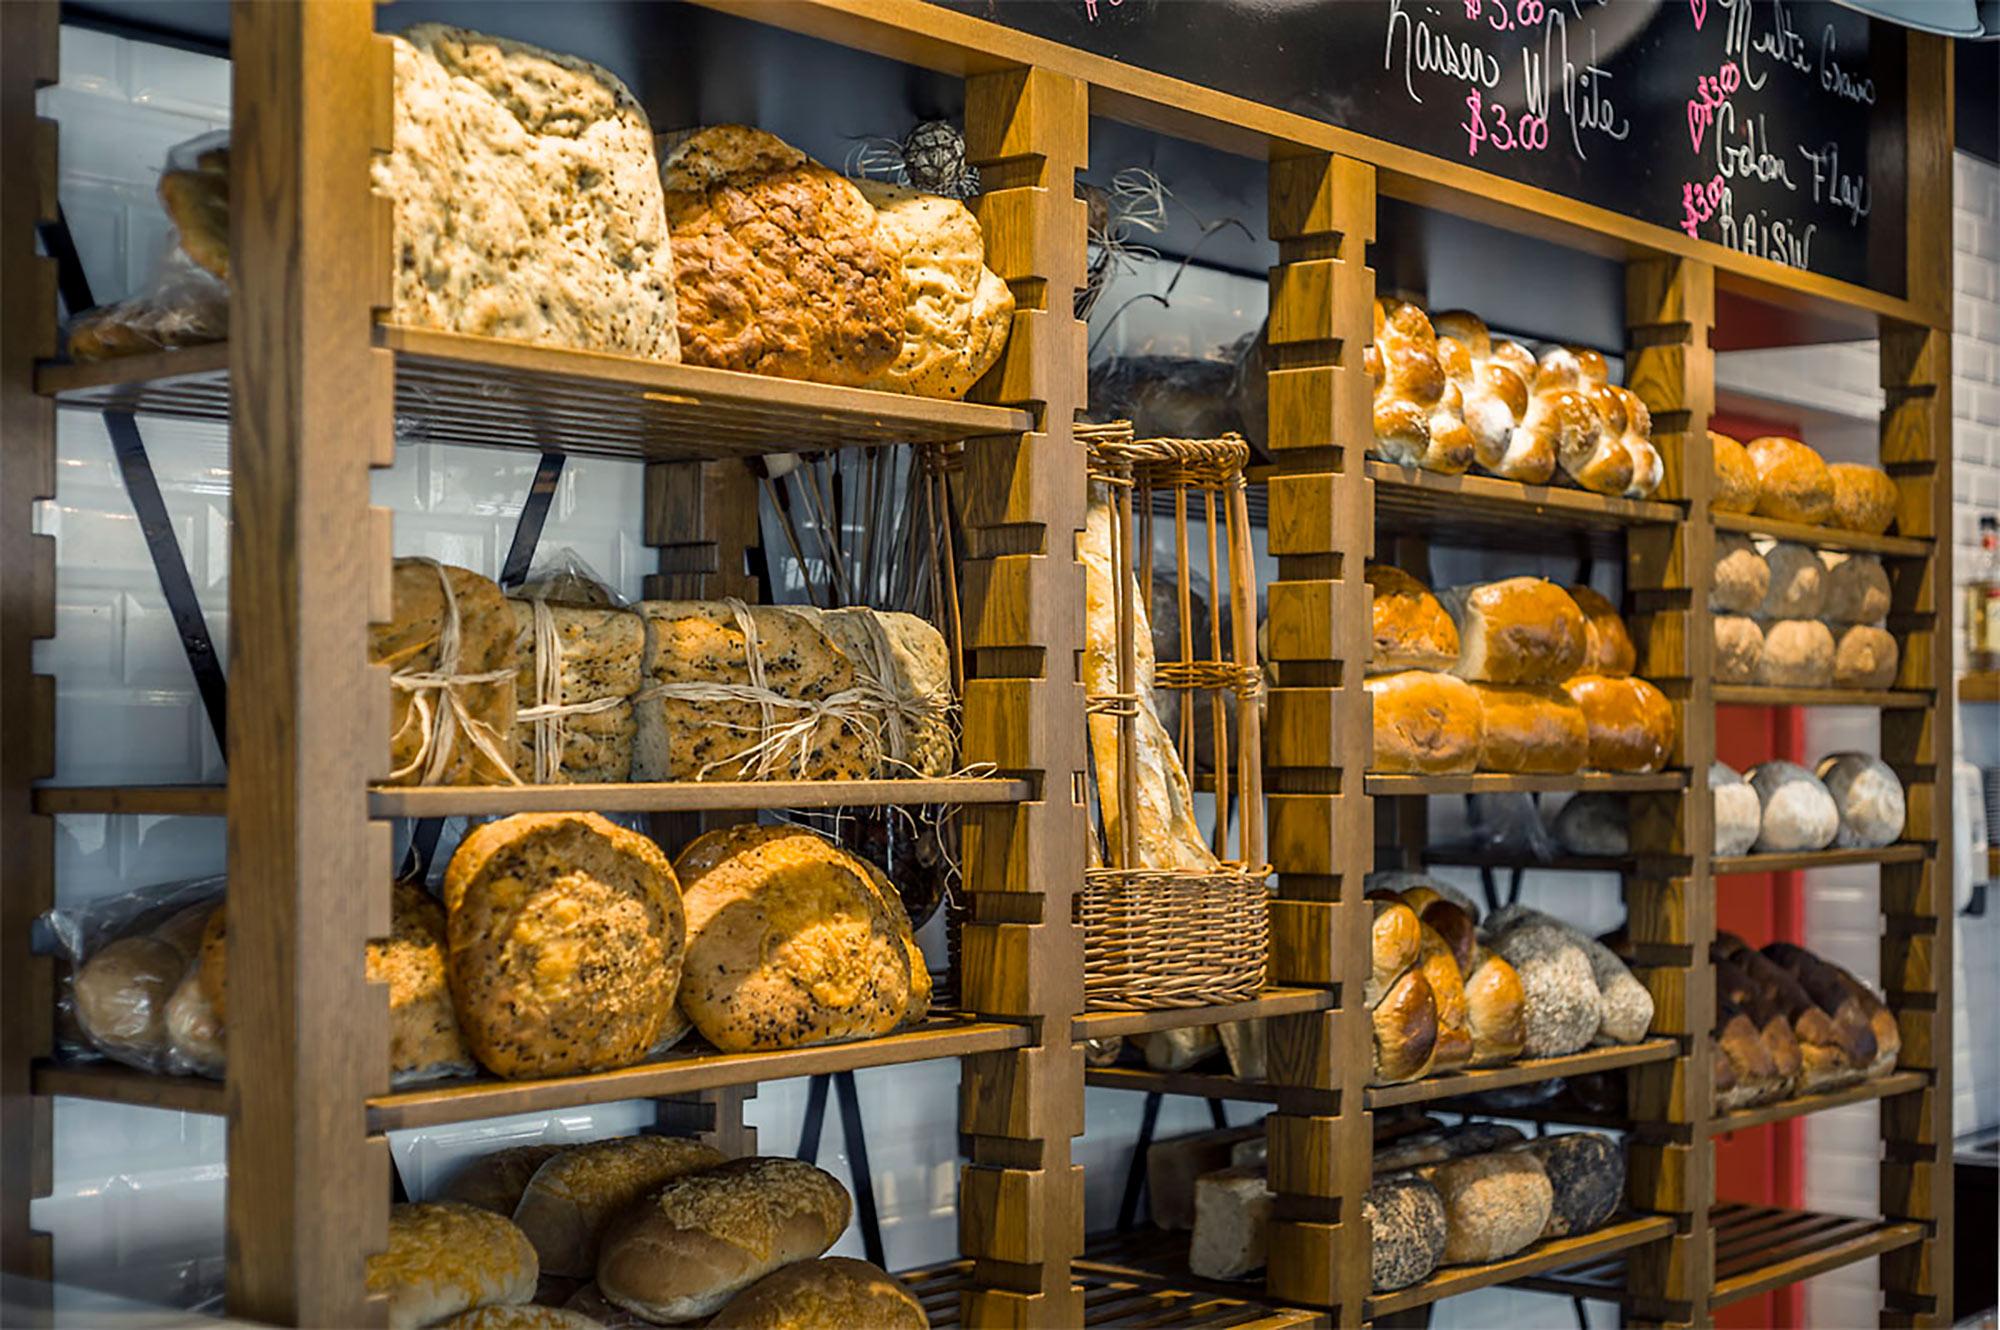 interior-design-cafe-bread-display.jpg